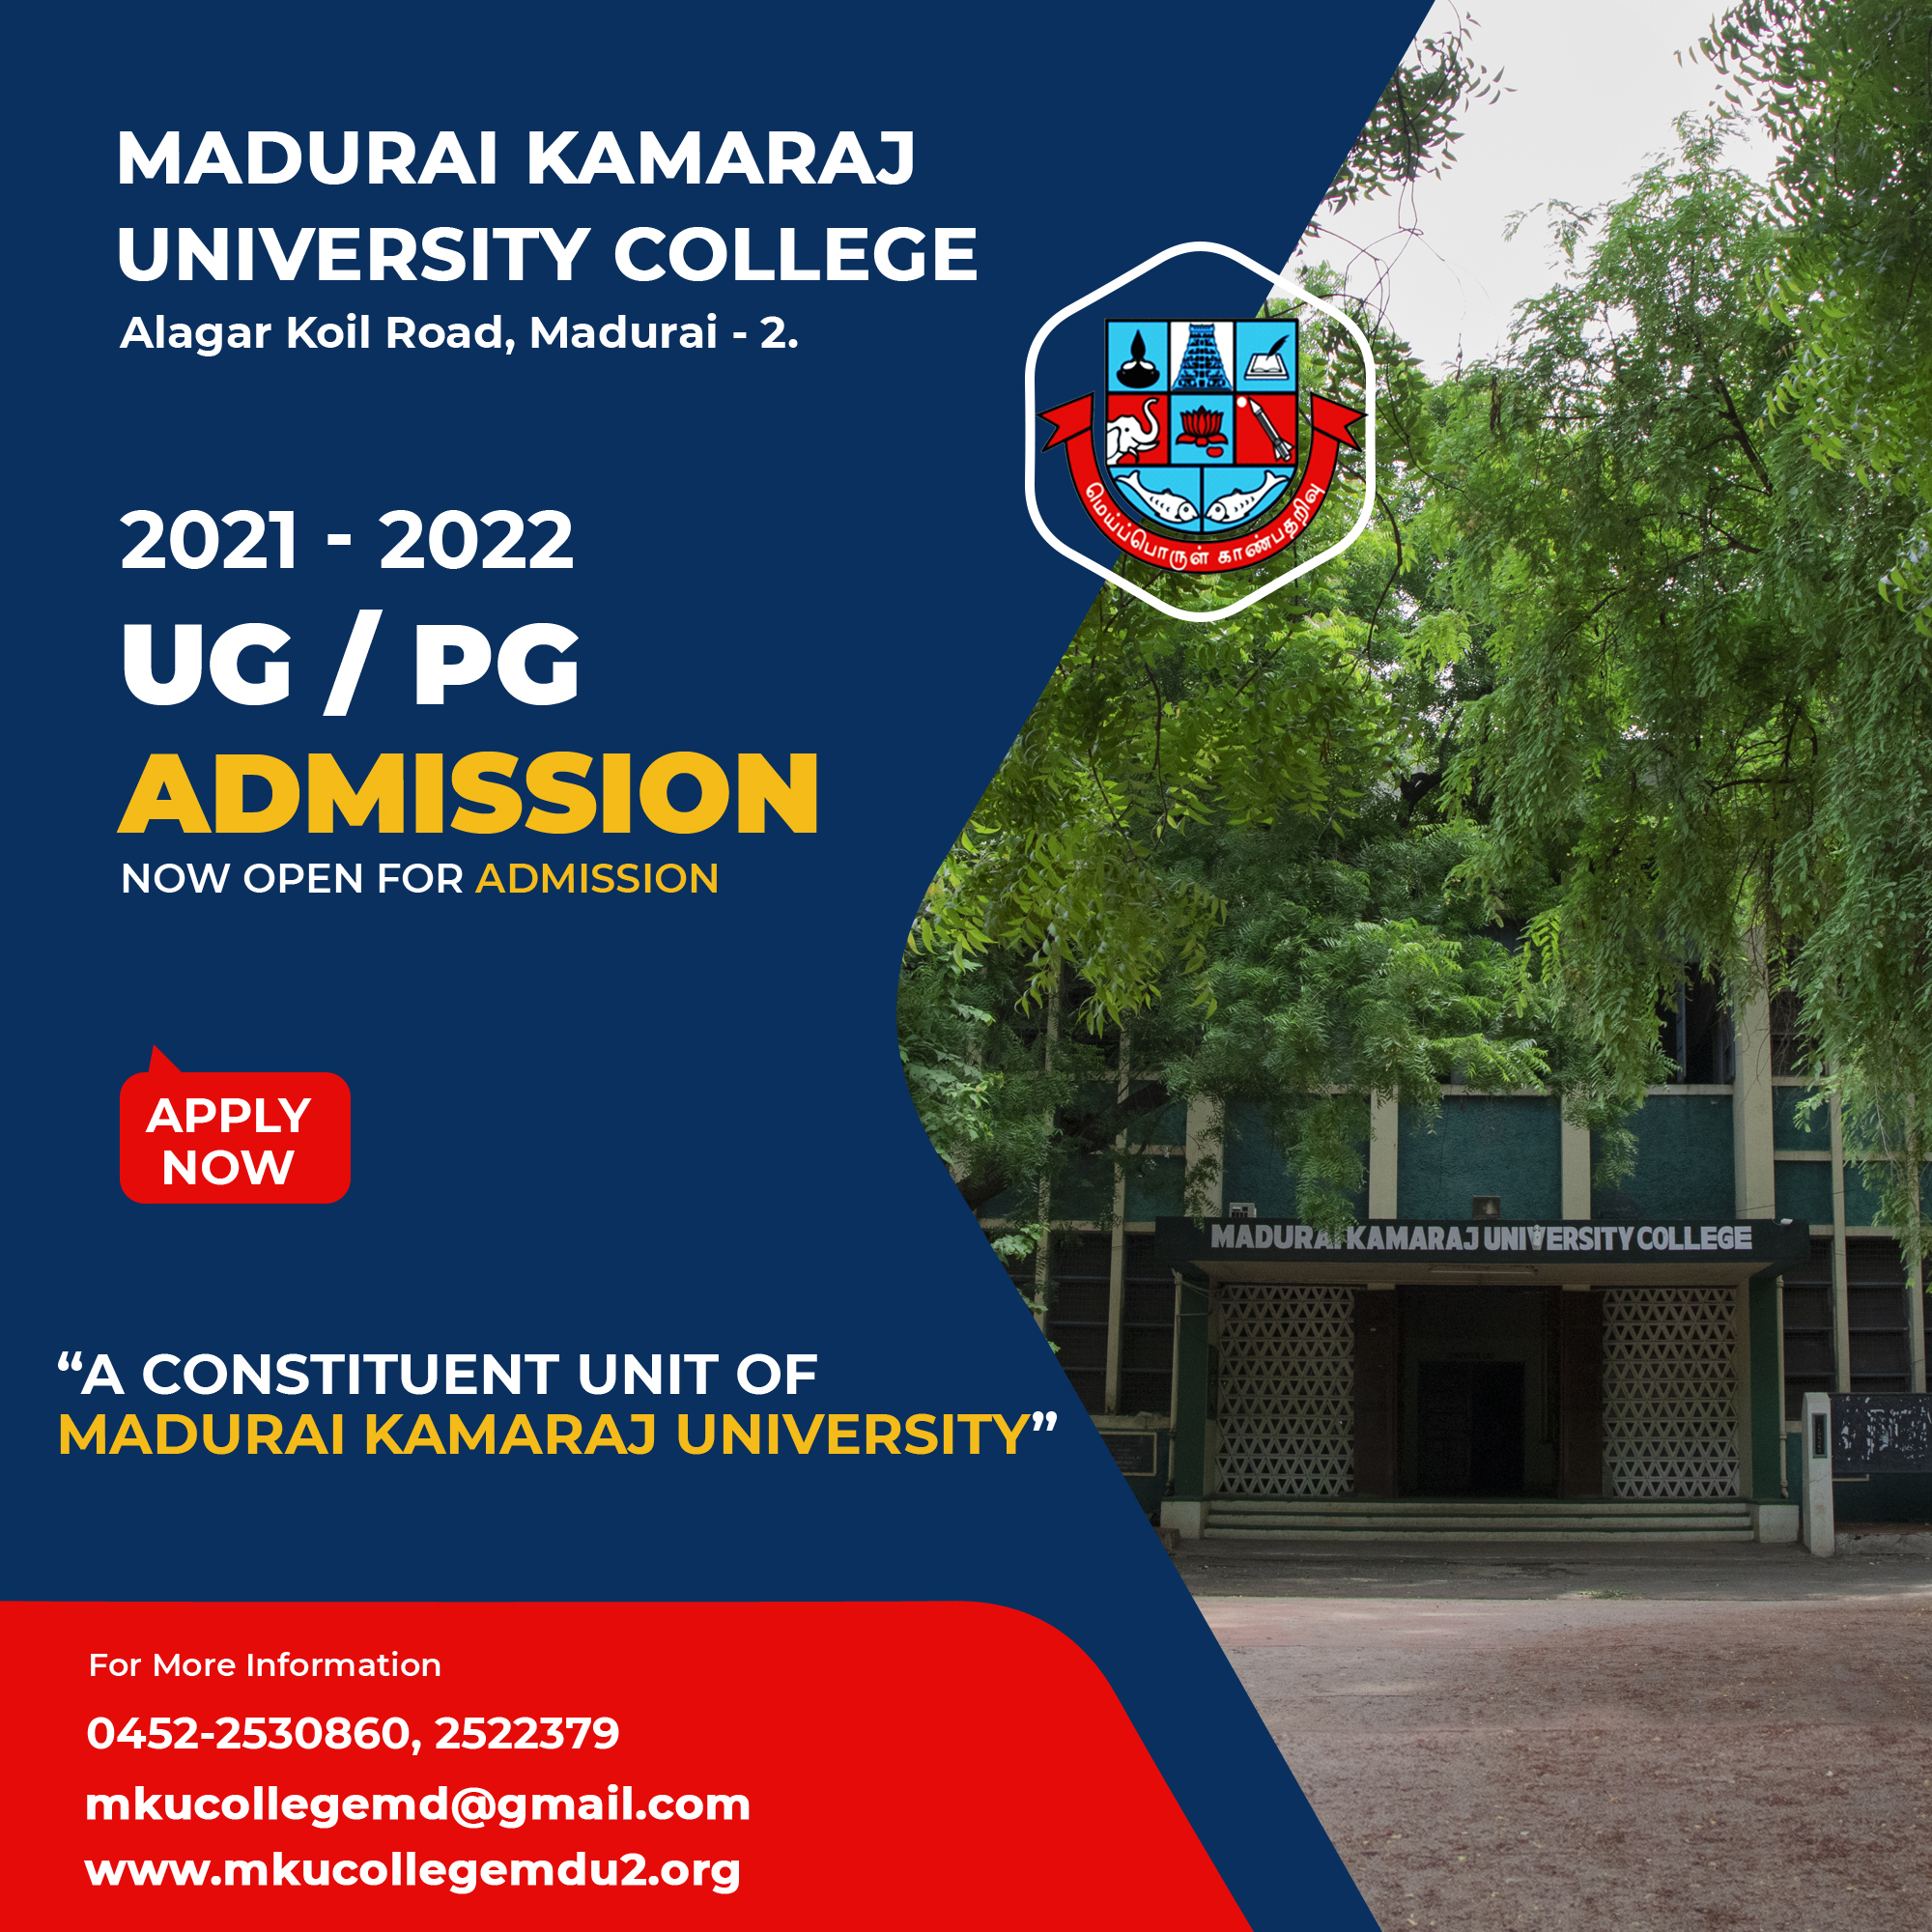 Online Application for 2021 - 22 Admission